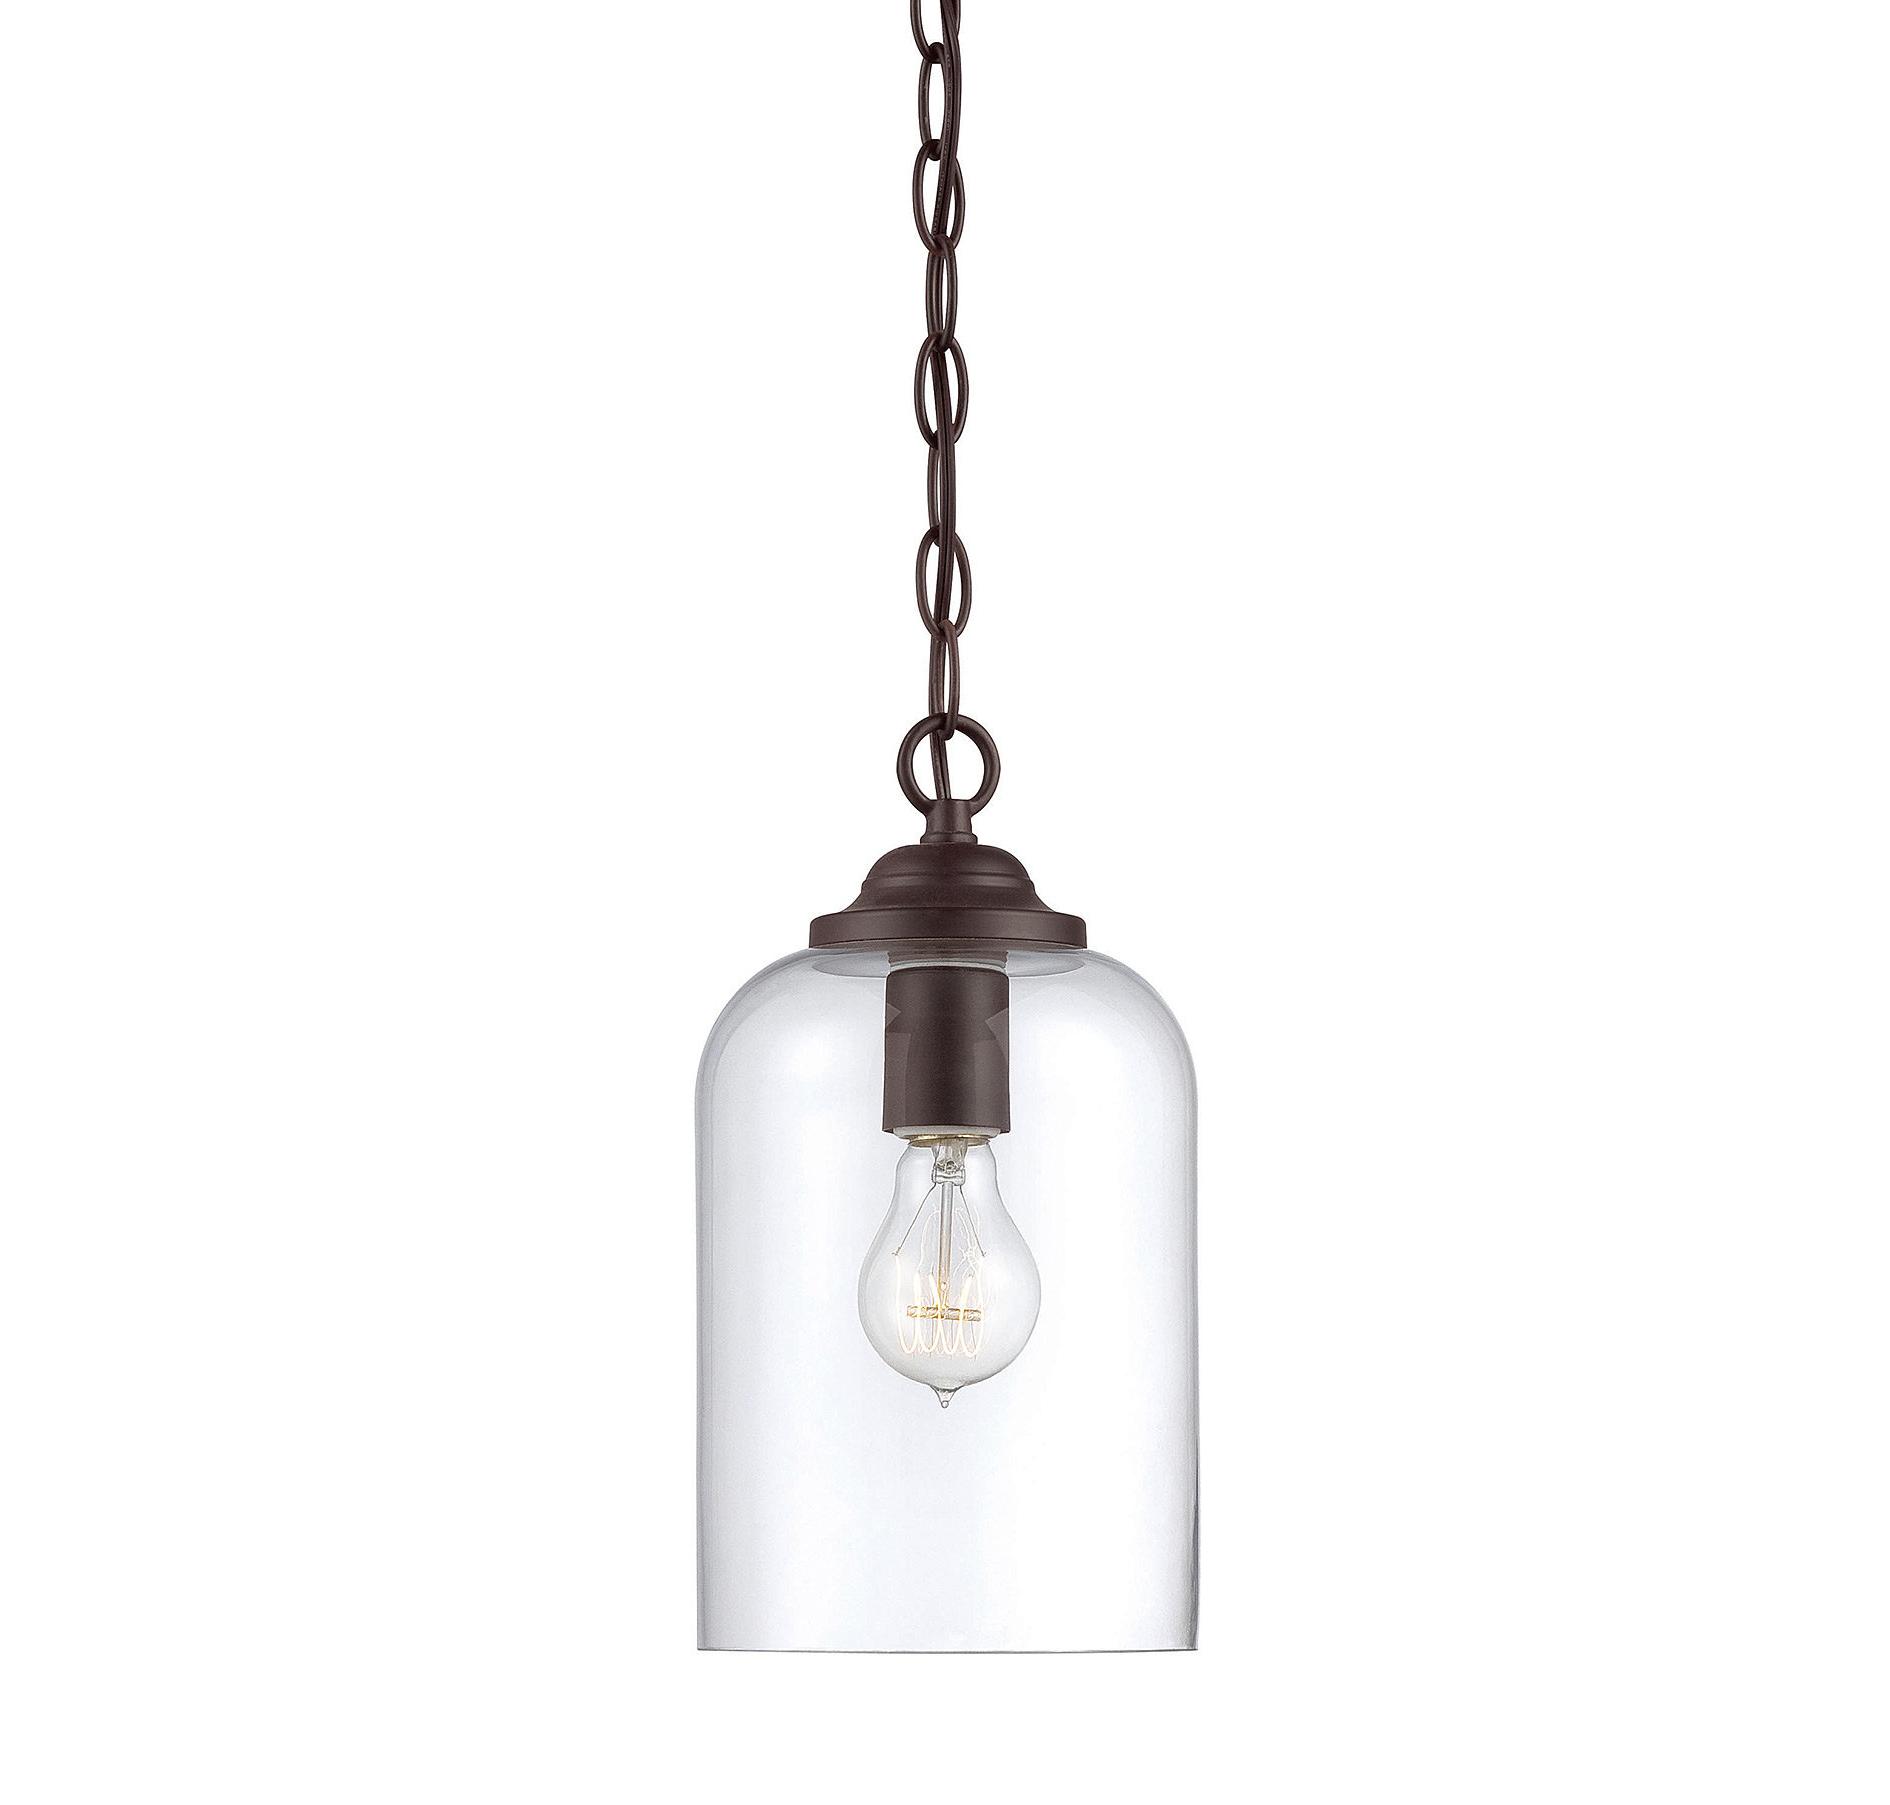 Popular Silber 1 Light Single Bell Pendant Throughout Nolan 1 Light Single Cylinder Pendants (View 19 of 25)